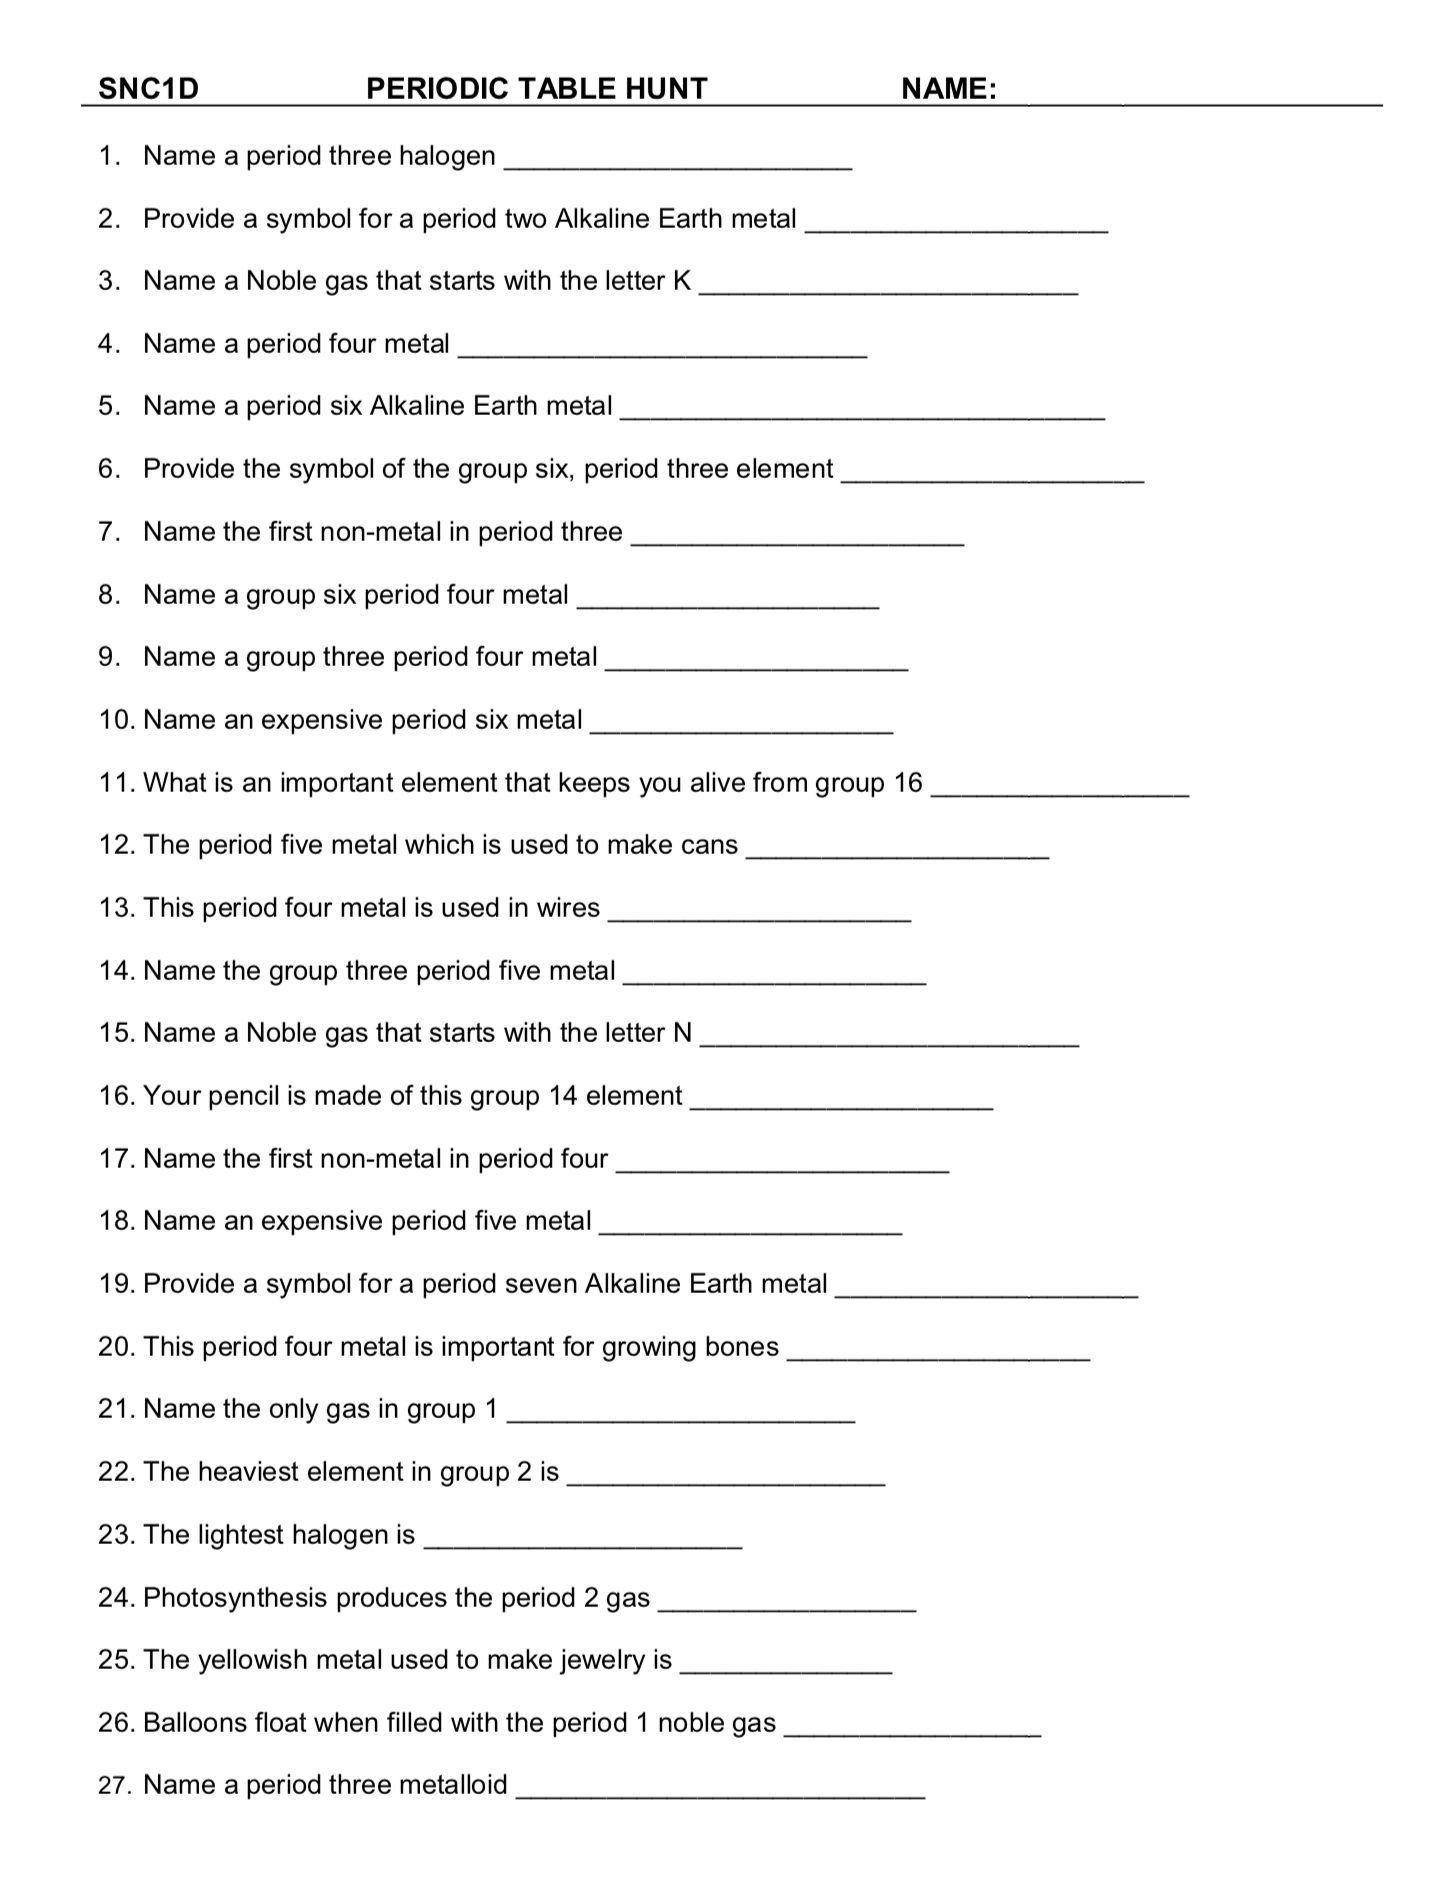 Hunting the Elements Worksheet Pin On Printable Blank Worksheet Template